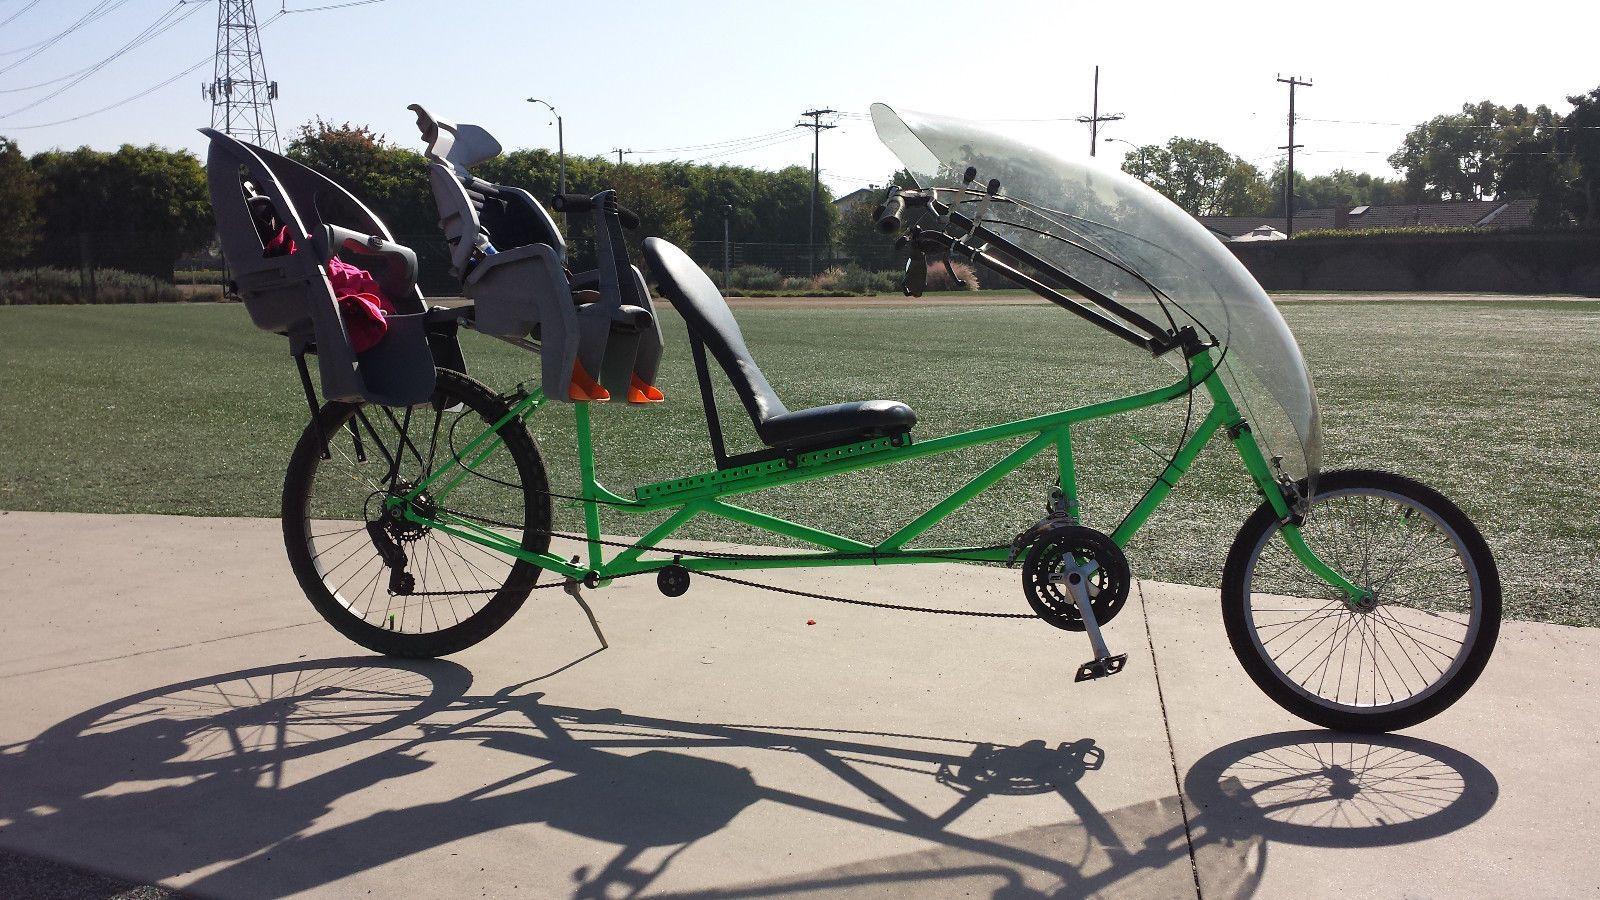 Tour Easy Recumbent Bike One Of A Kind Custom 2 Child Seats Free Delivery In Oc Ebay Bike Tandem Bike Kids Seating